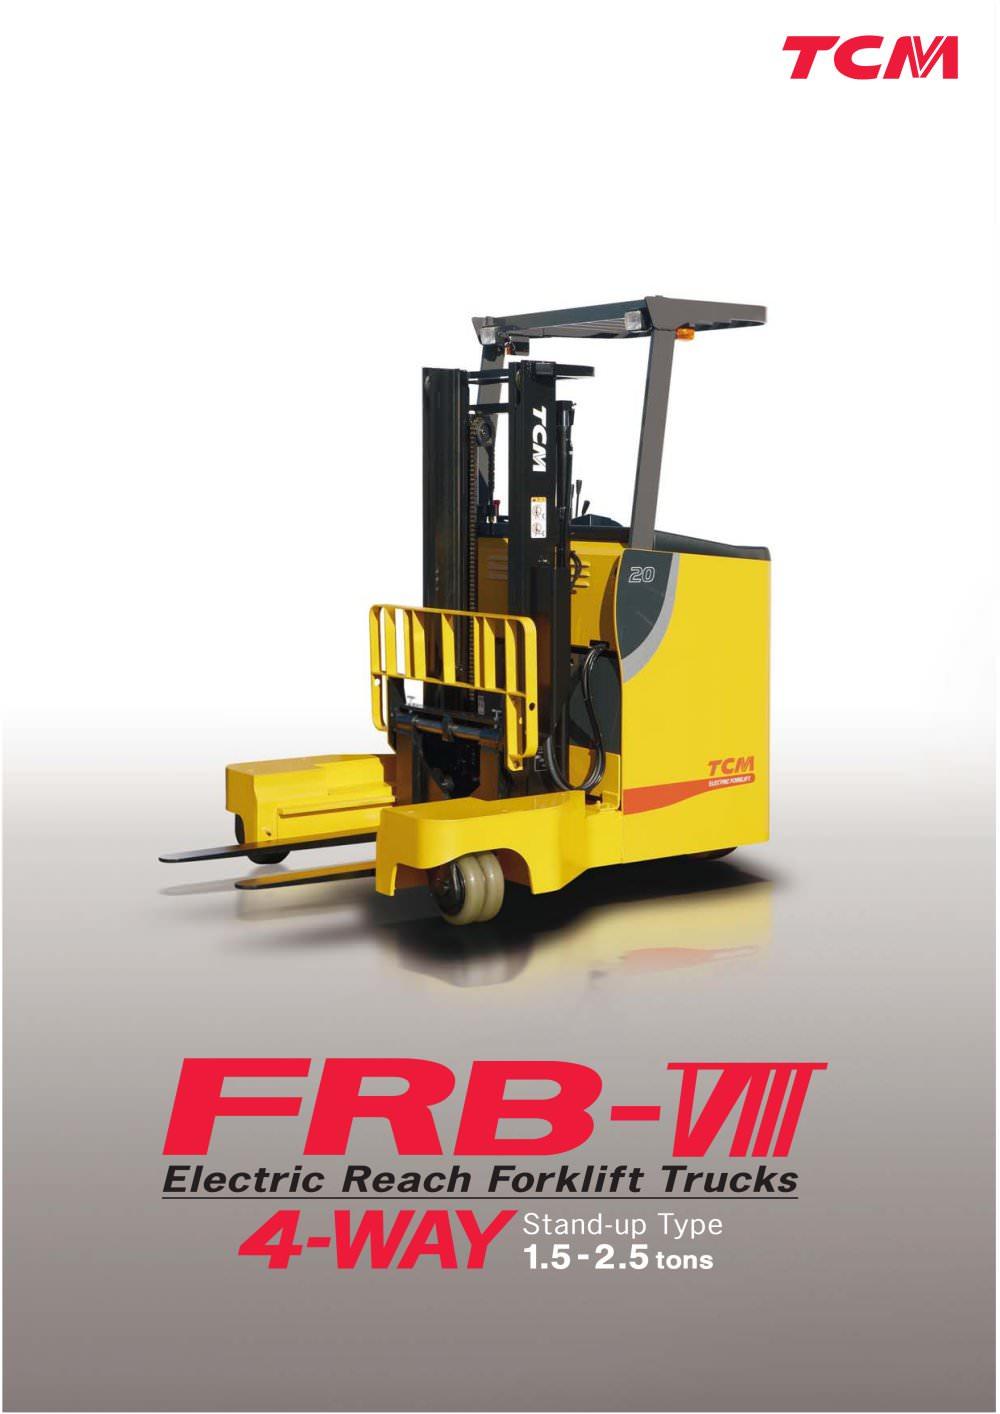 FRB-VIII 4WAY - TCM - PDF Catalogue   Technical Documentation   Brochure